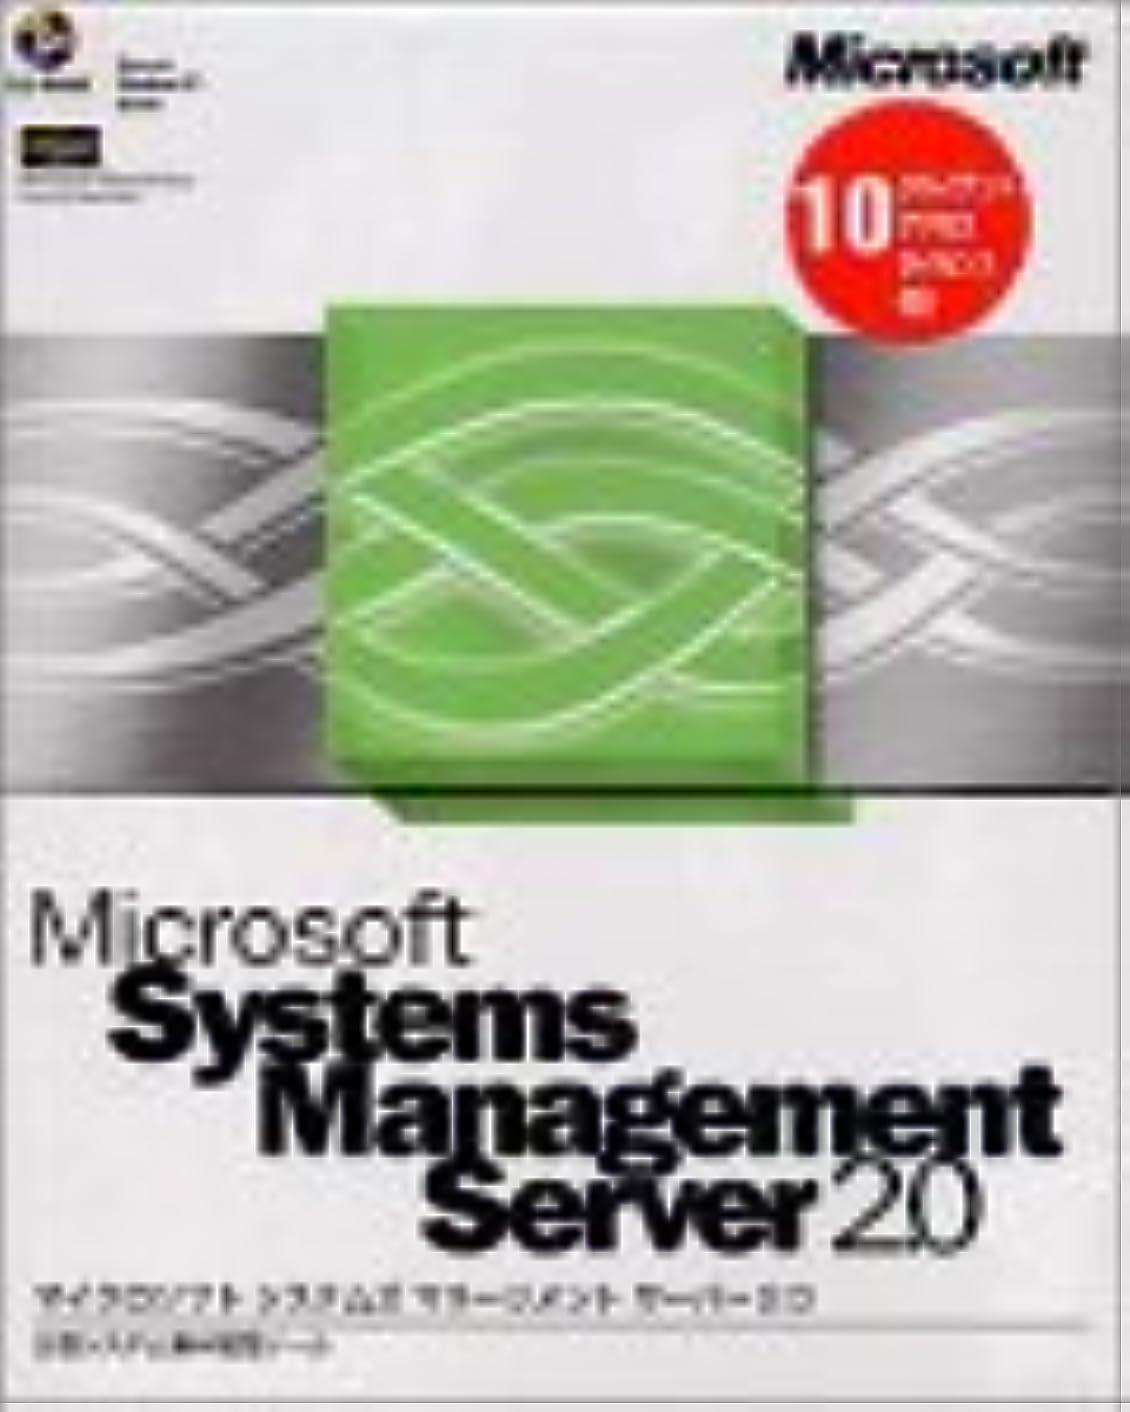 Microsoft Systems Management Server 2.0 10クライアントアクセスライセンス付